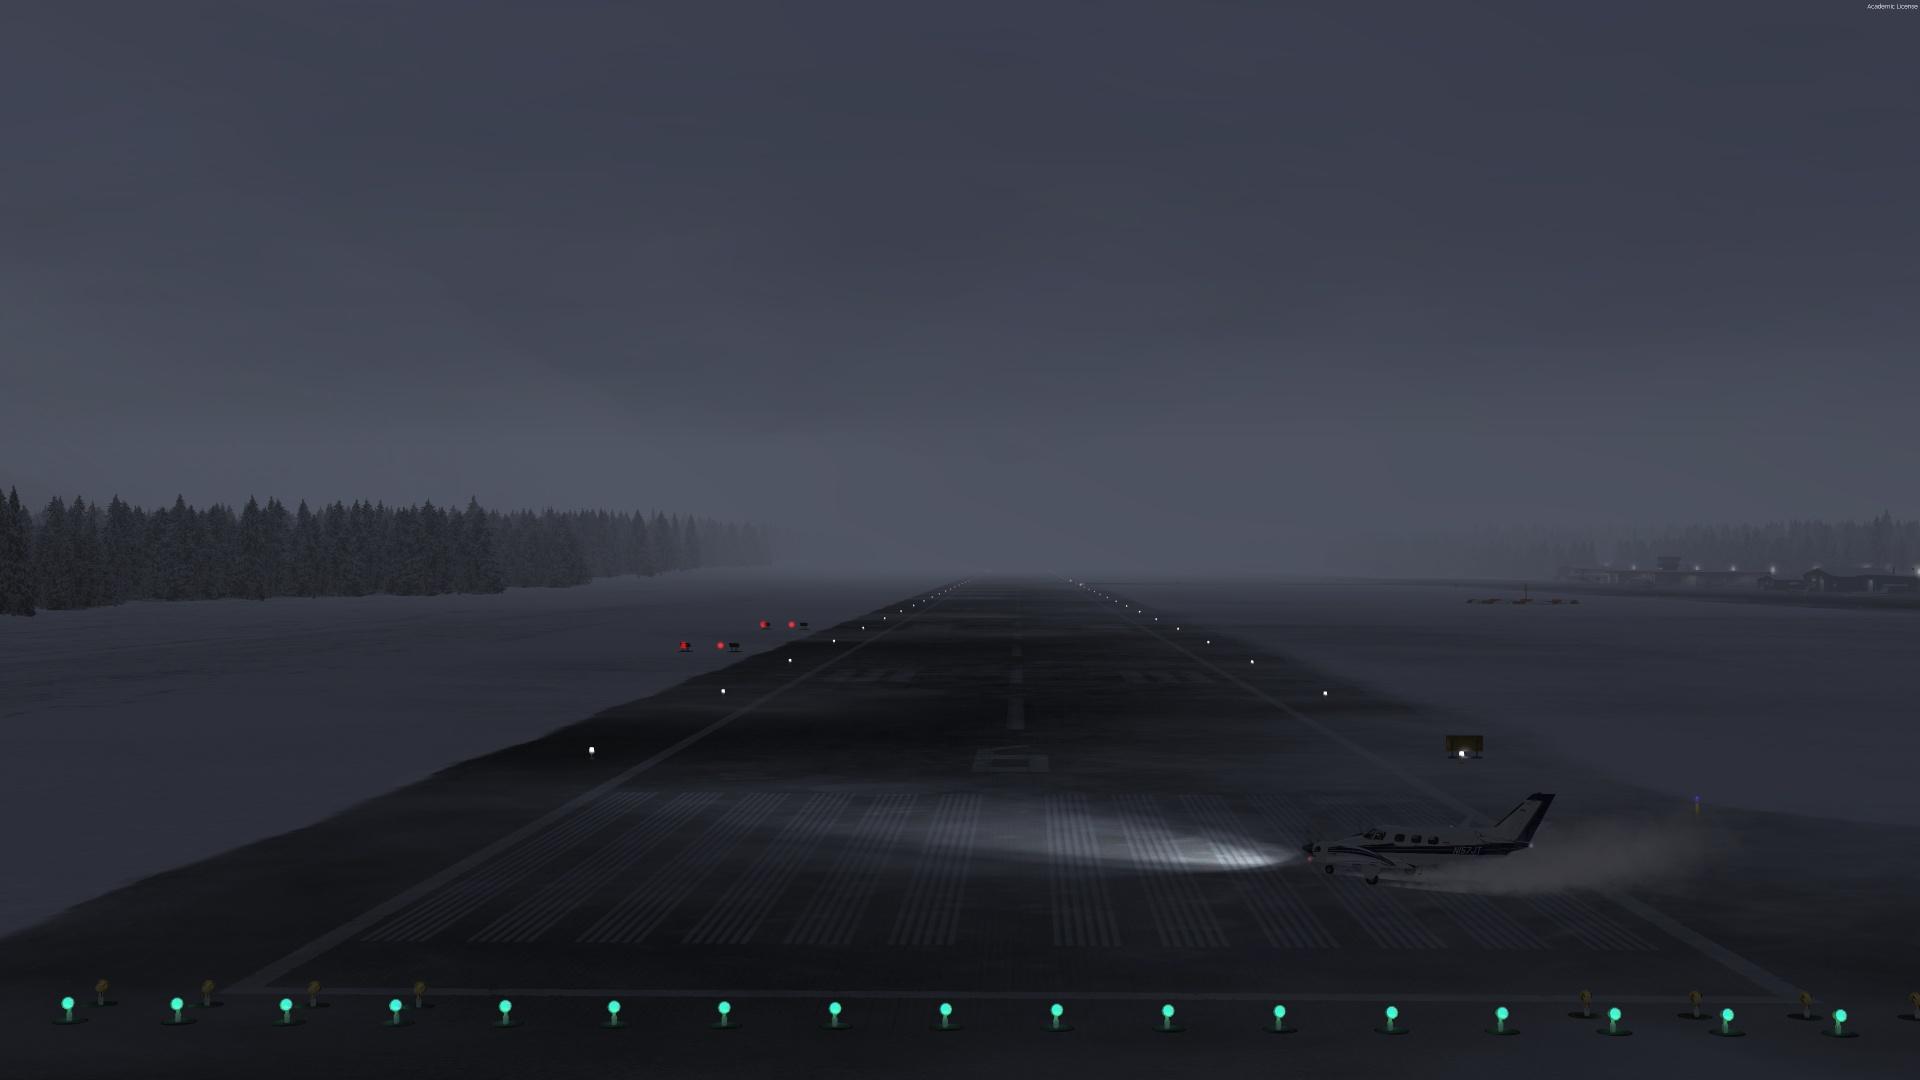 pavd-pajn-1080p004.jpg